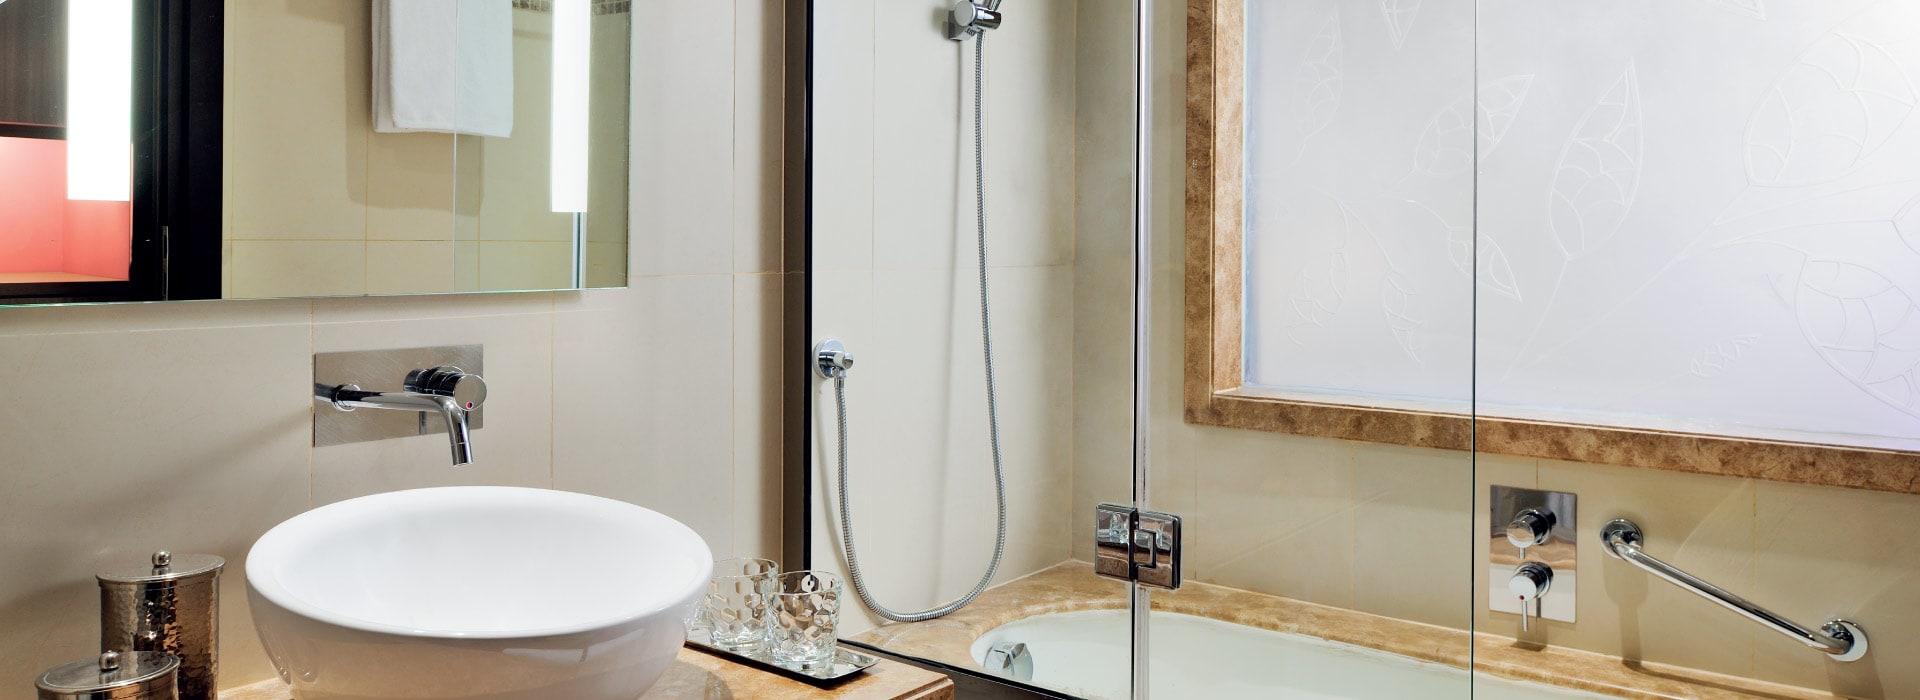 Executive room bathroom of a Business Hotel Dubai